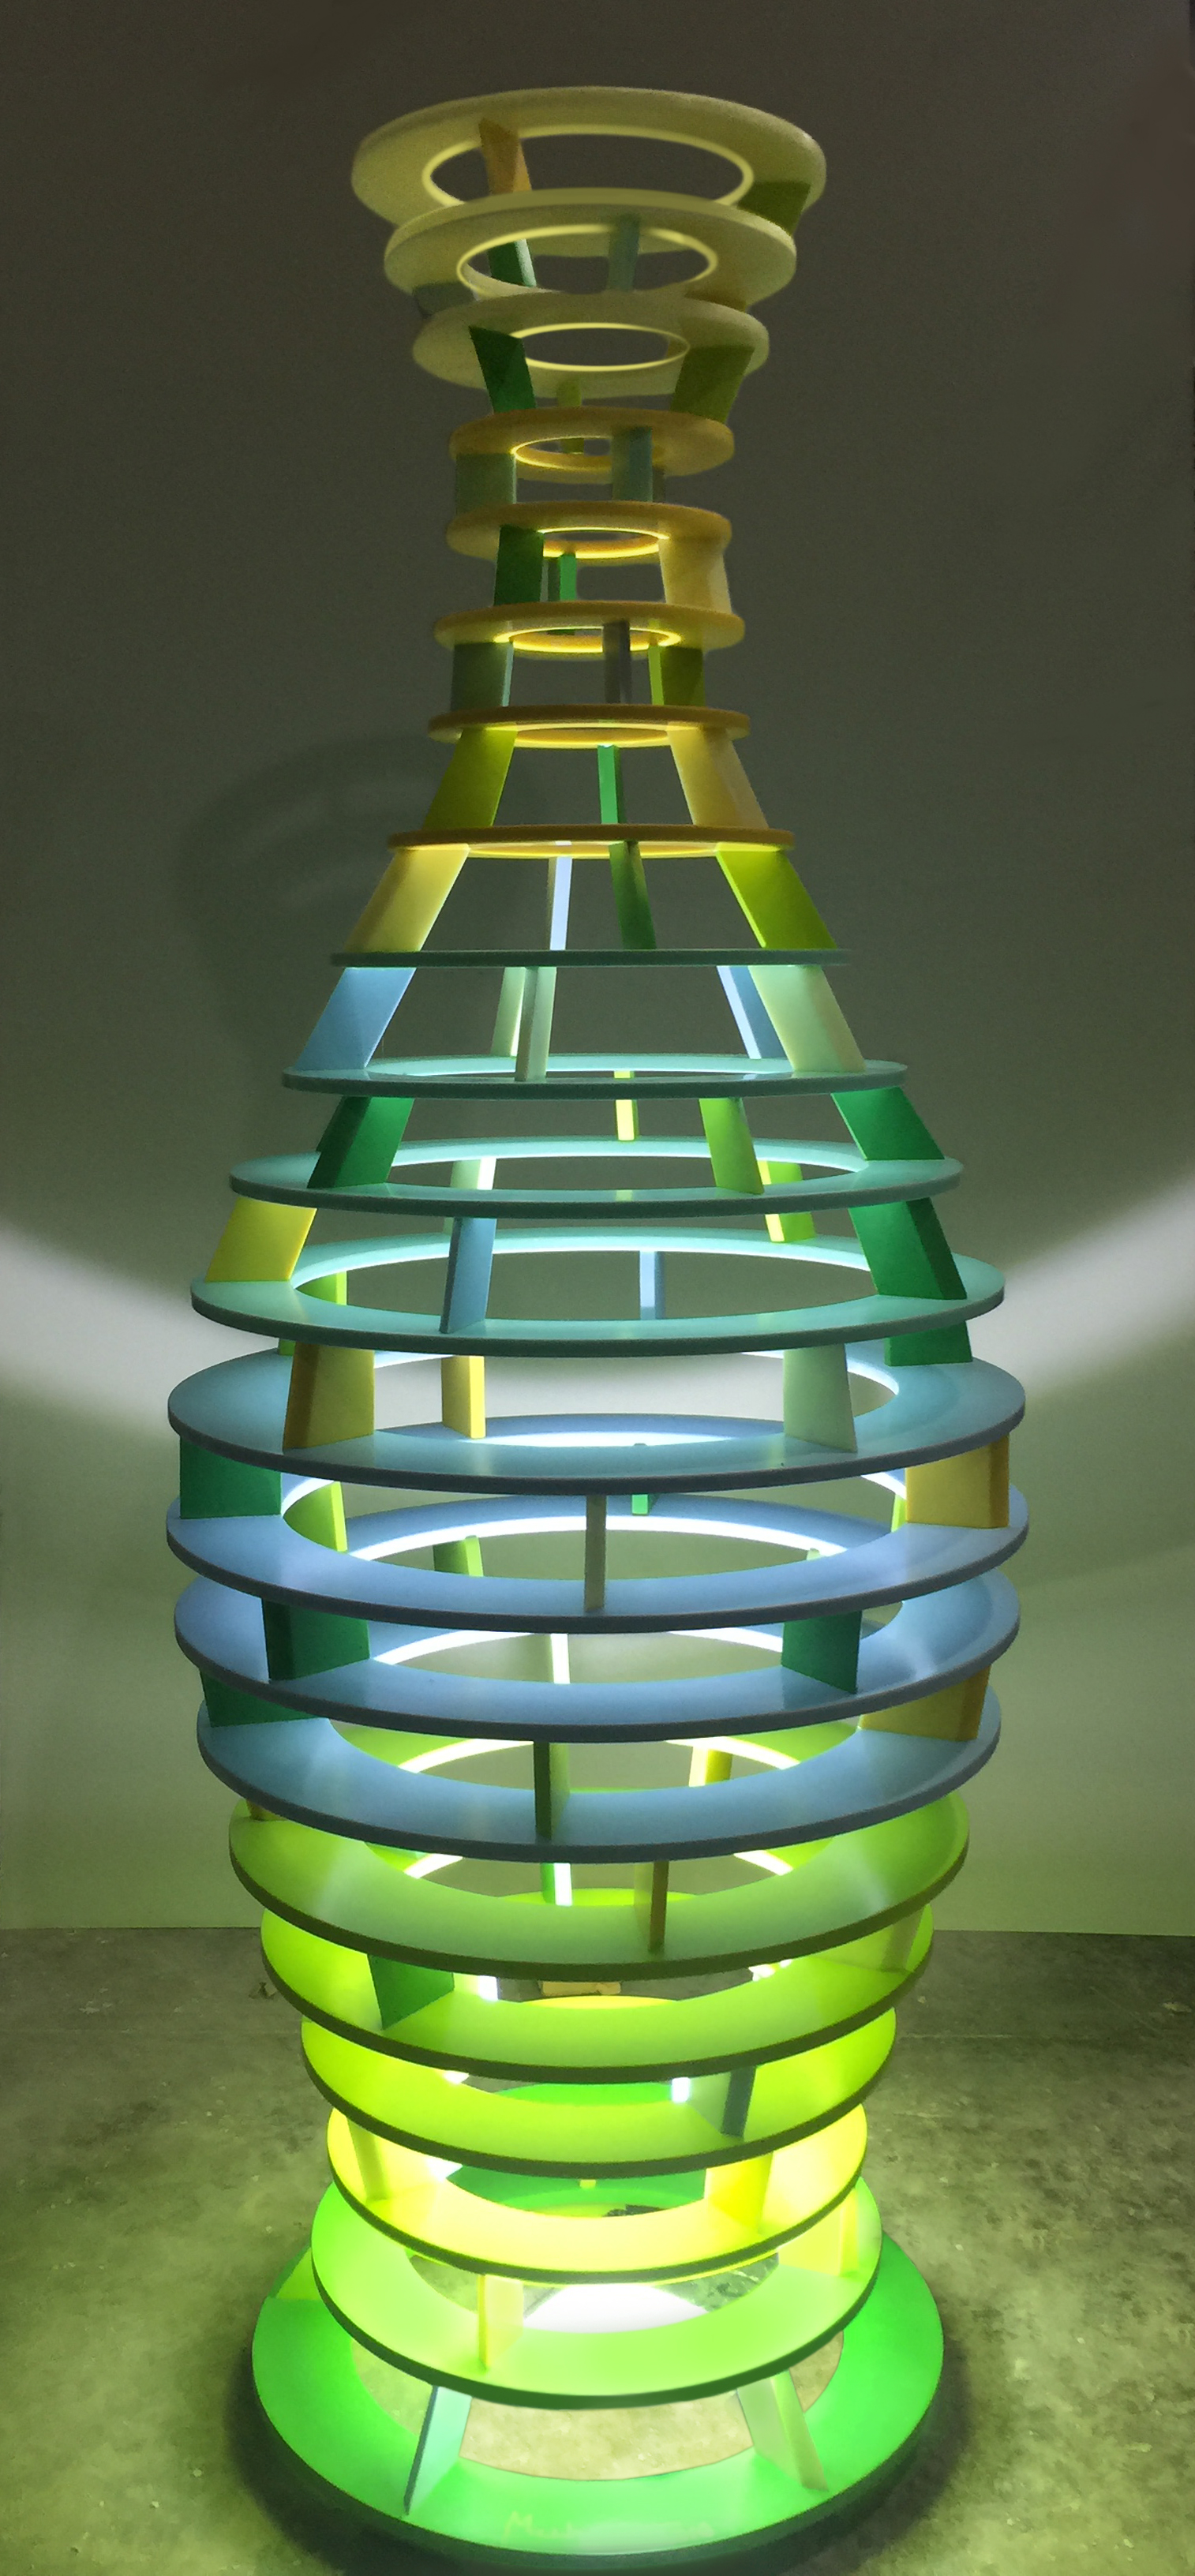 en]MUHER creates a FENG SHUI sculpture for Philips